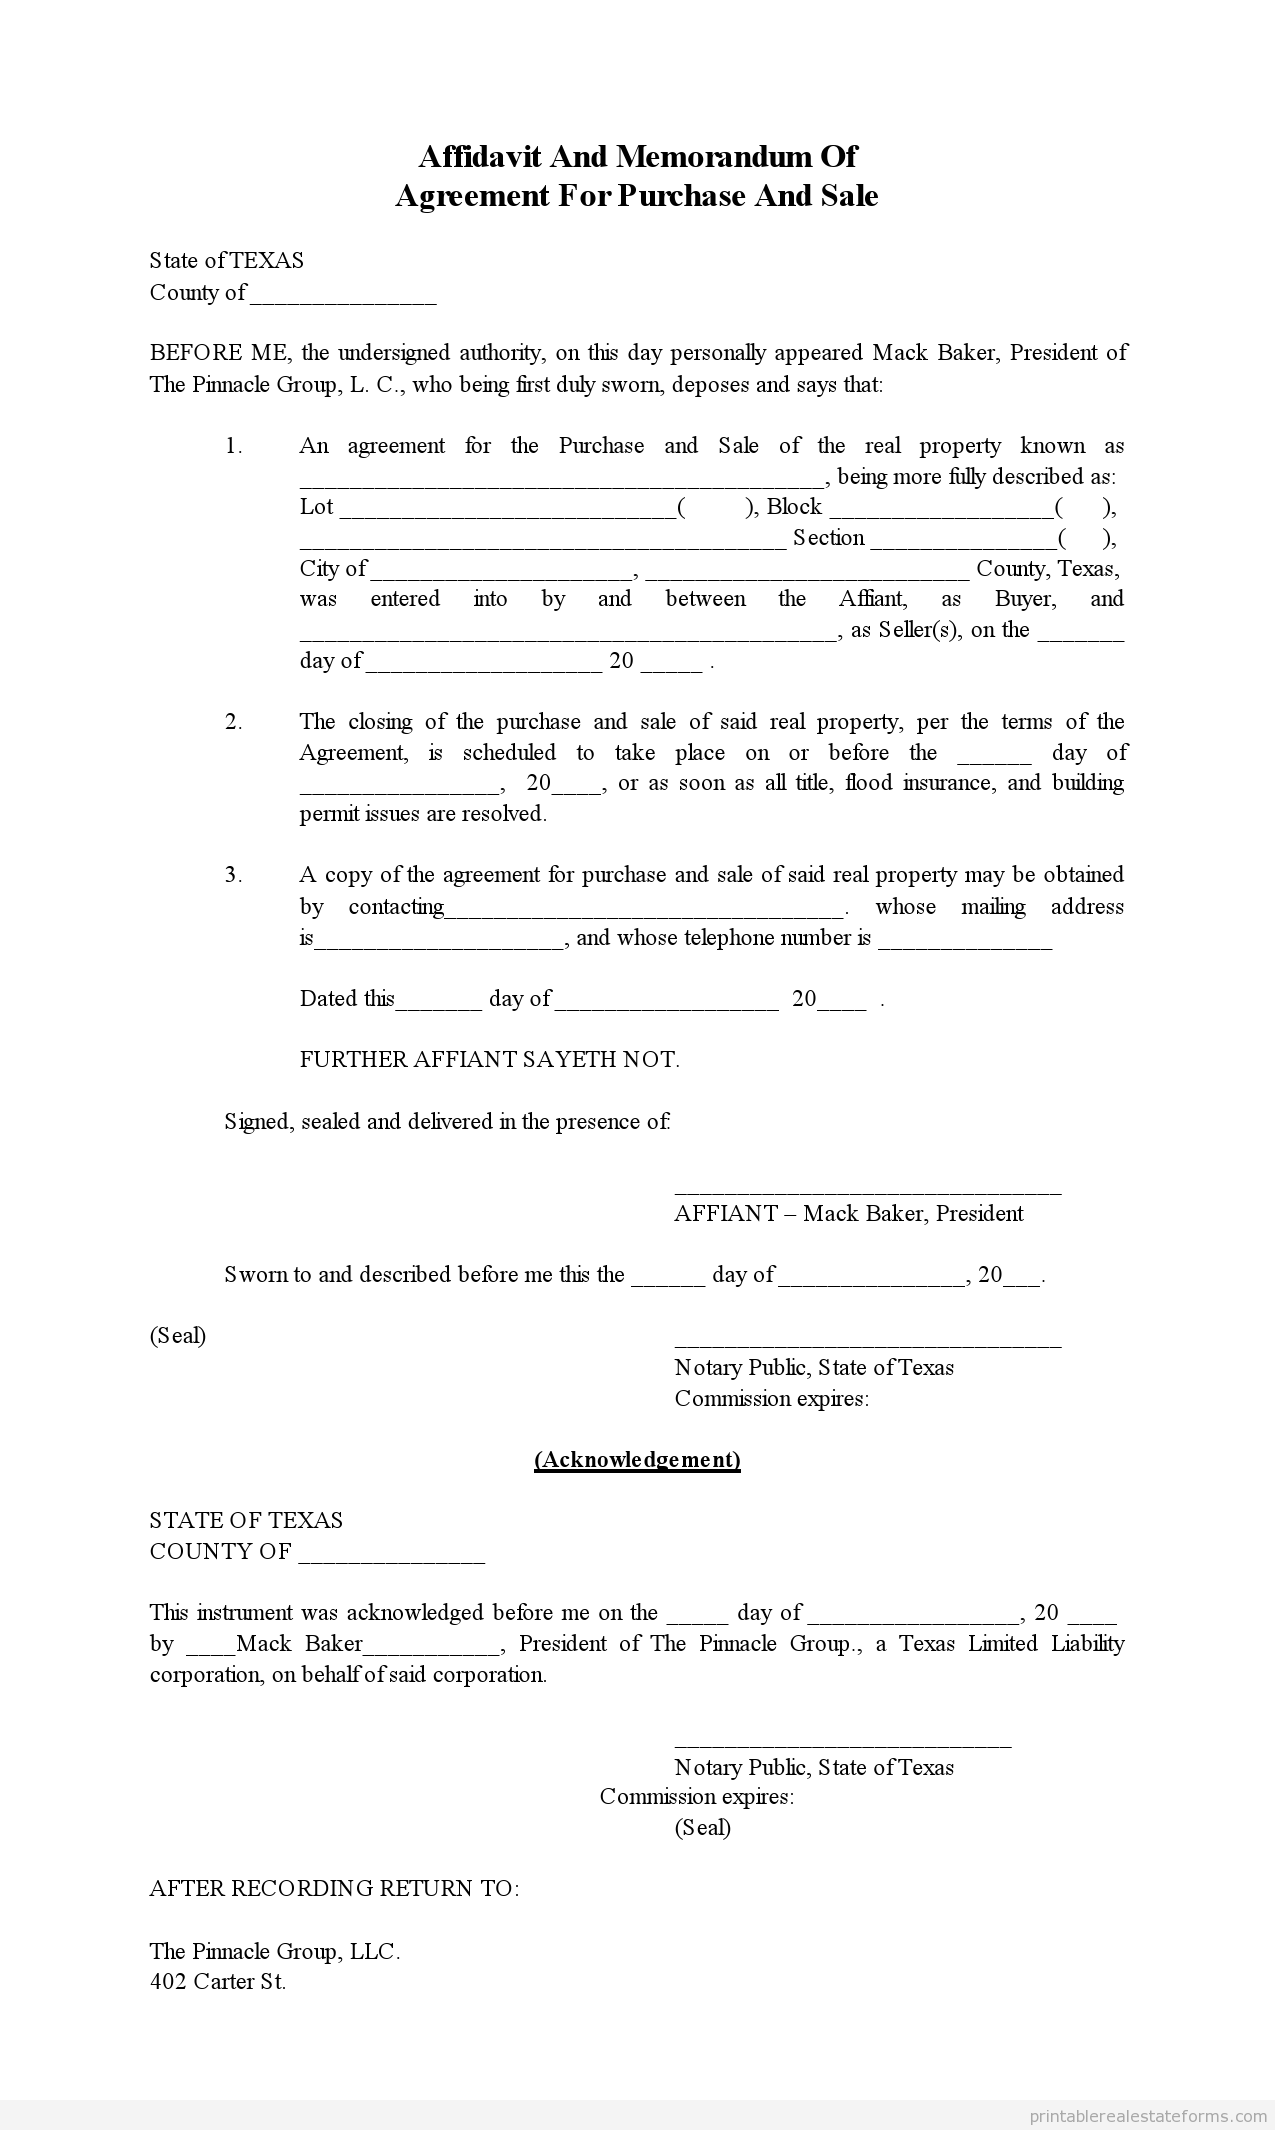 Sample Printable affidavit of memorandum for purchase and